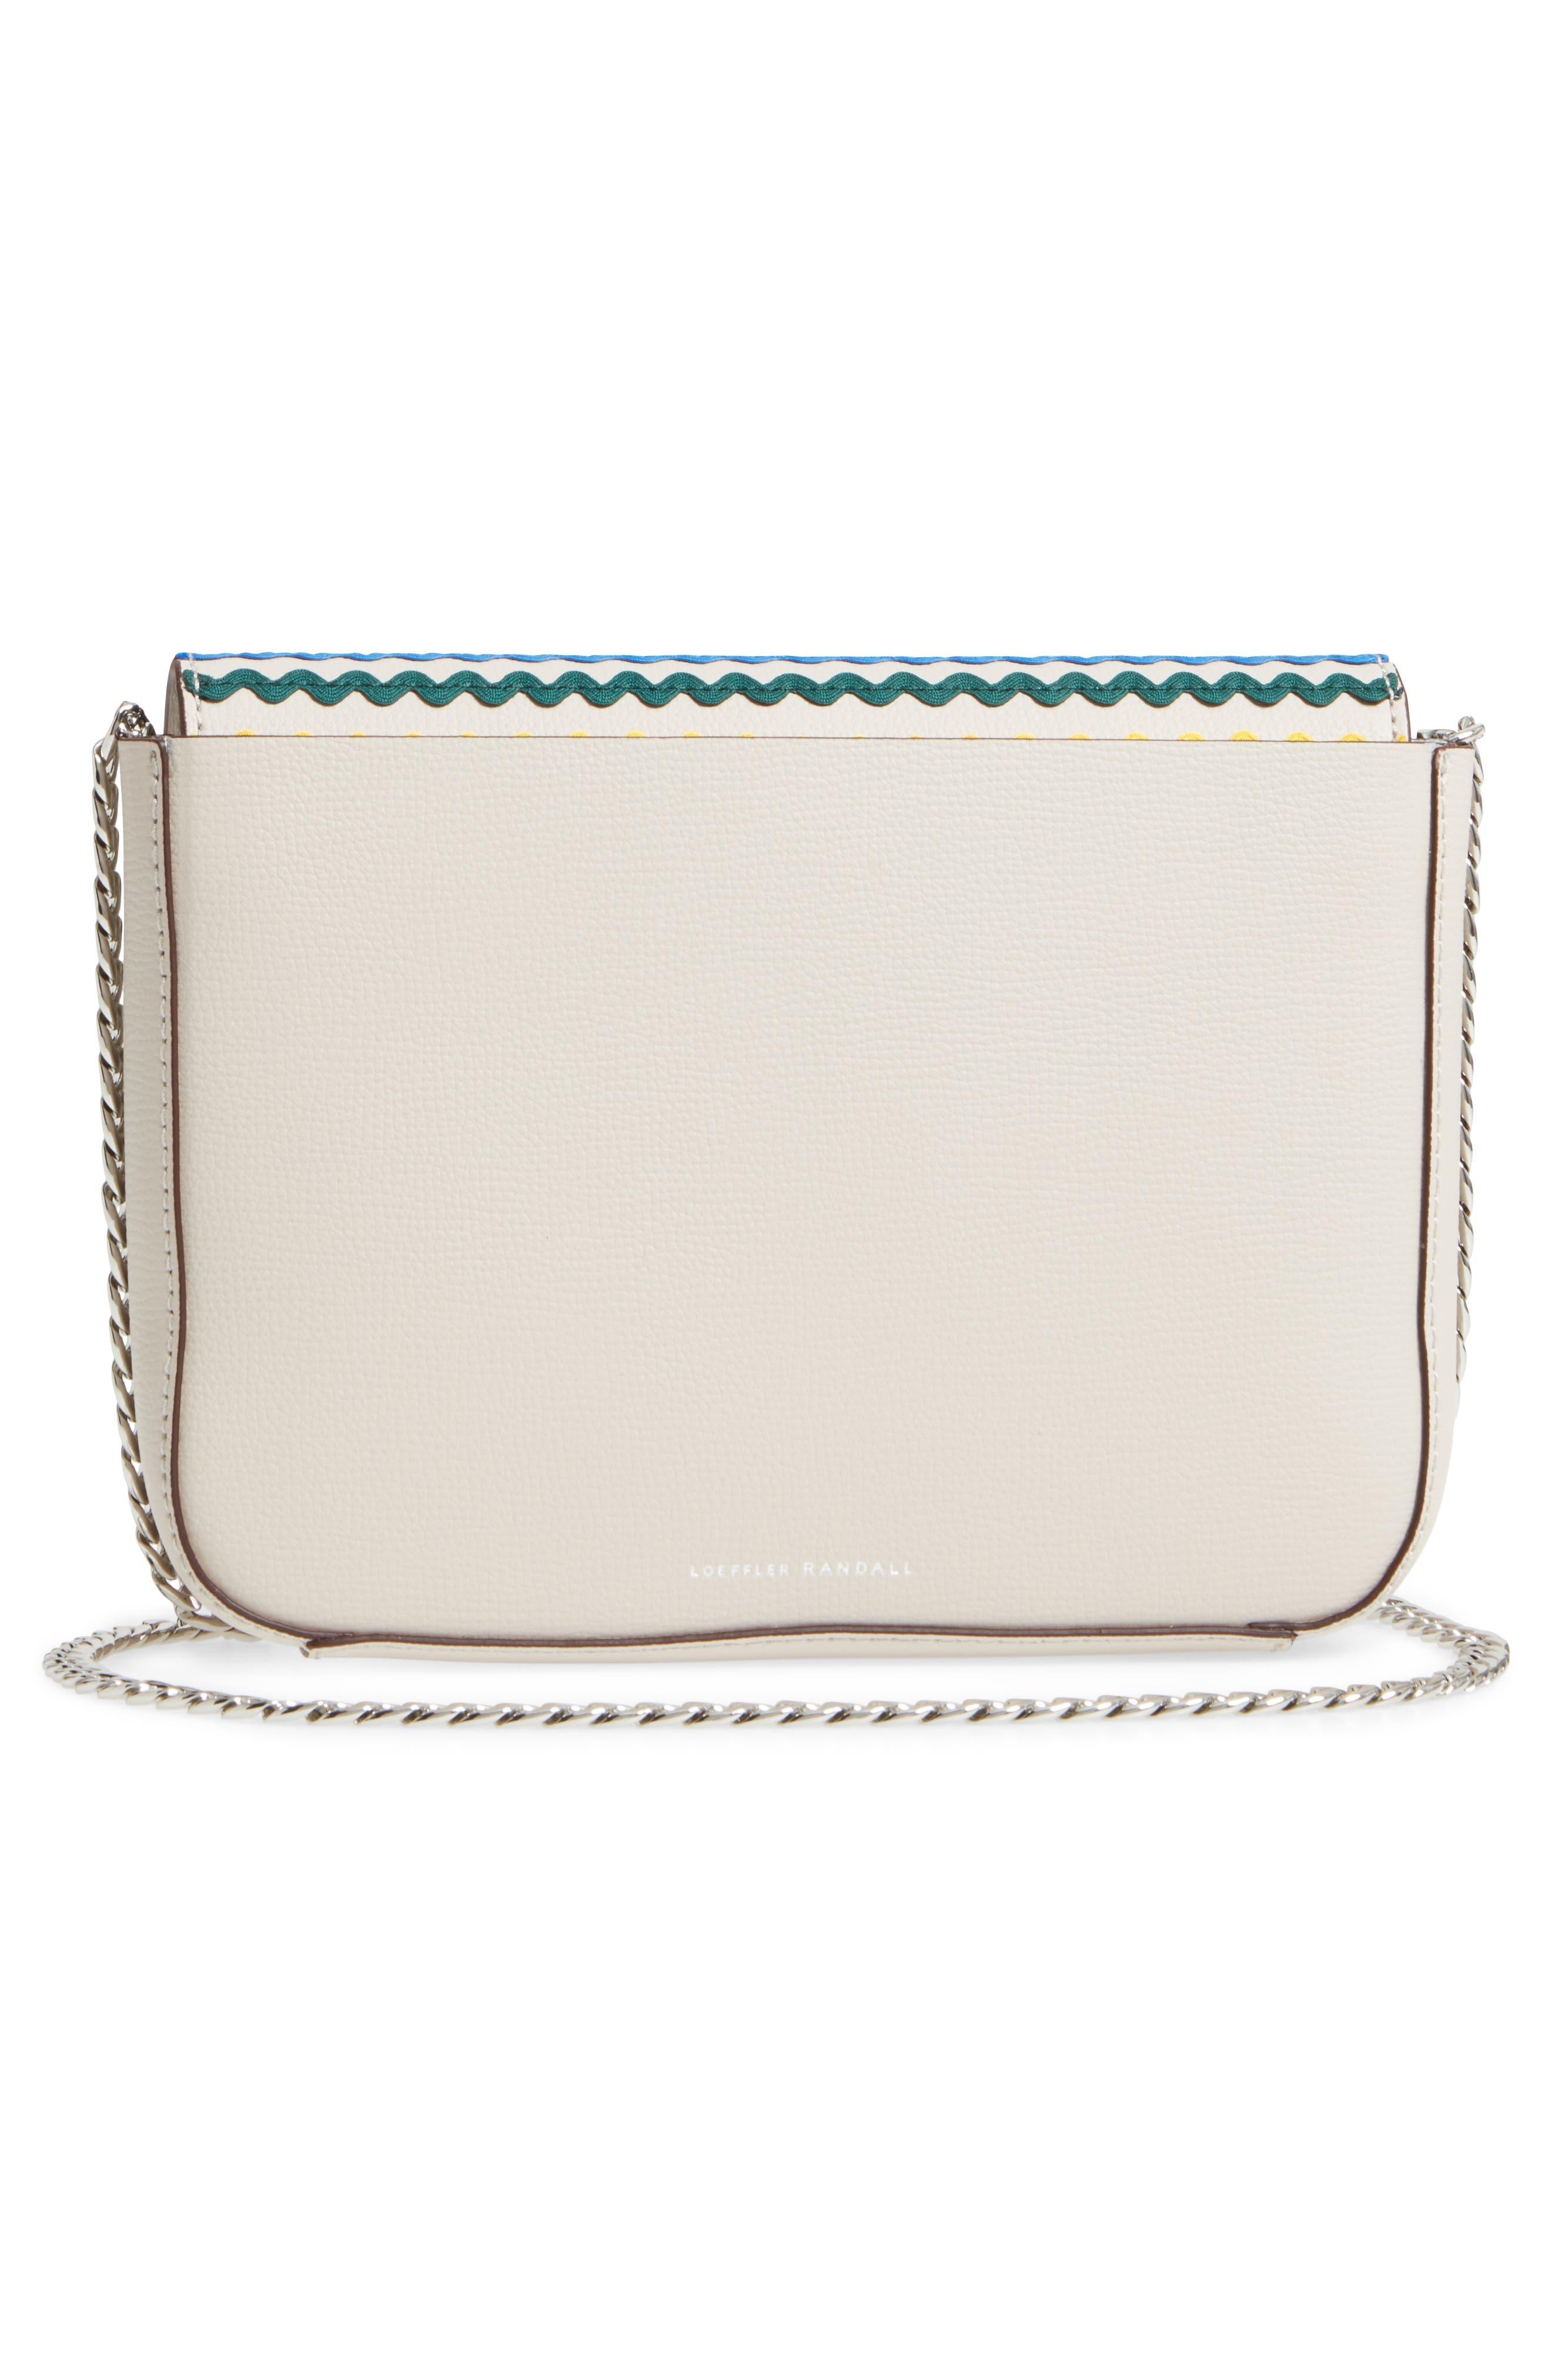 Lock Leather Flap Clutch/Shoulder Bag,                             Alternate thumbnail 3, color,                             030